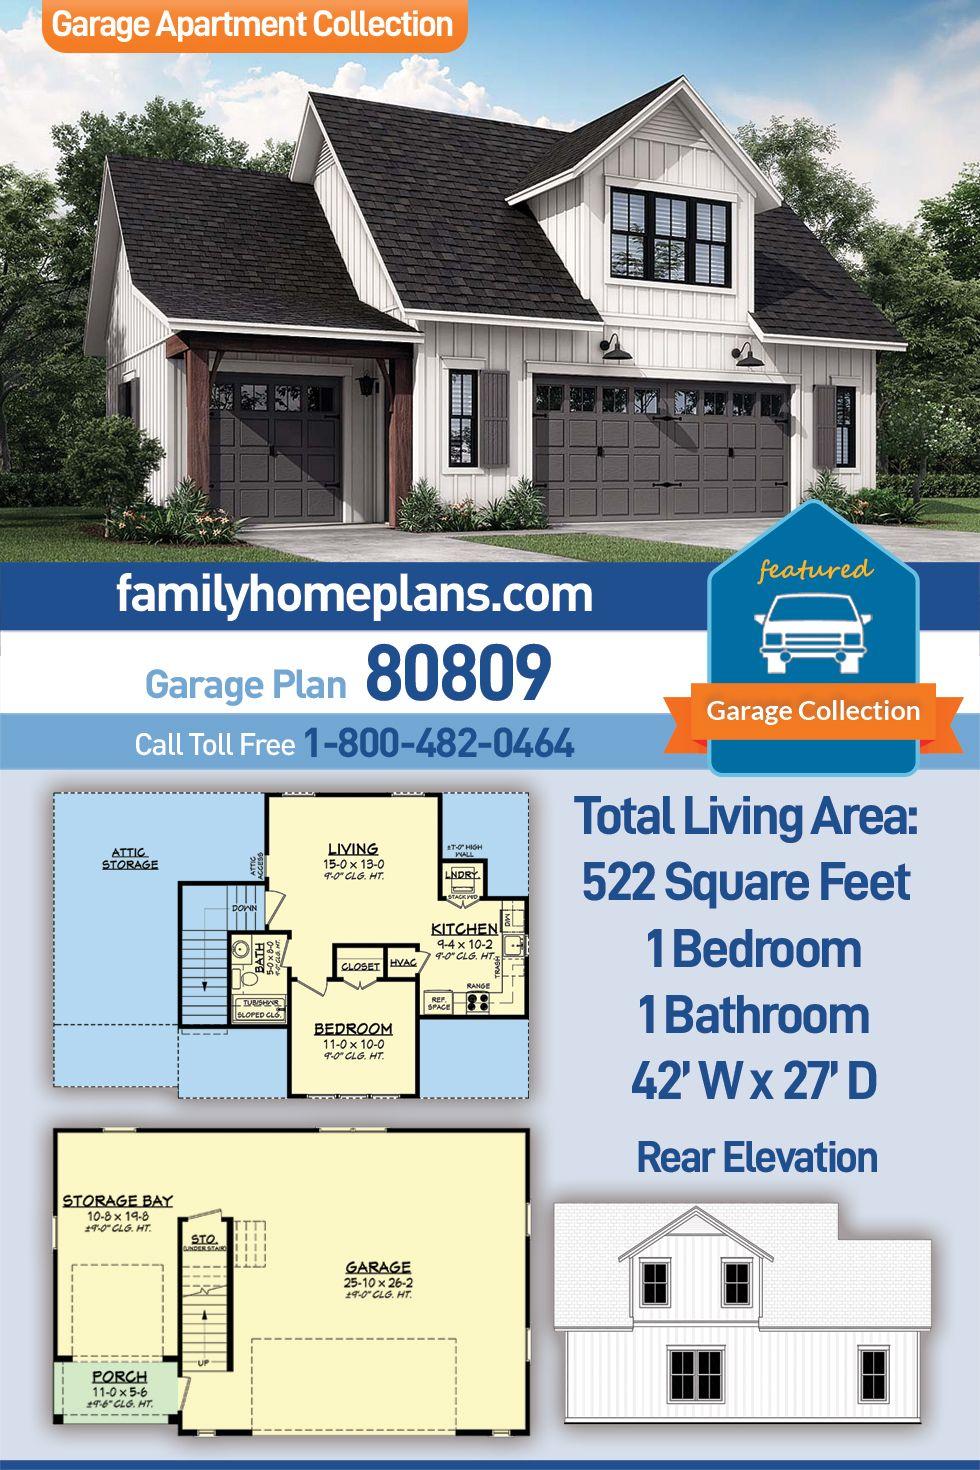 Farmhouse Style 3 Car Garage Apartment Plan Number 80809 With 1 Bed 1 Bath Garage Apartment Plan Garage Apartments House Plans Farmhouse